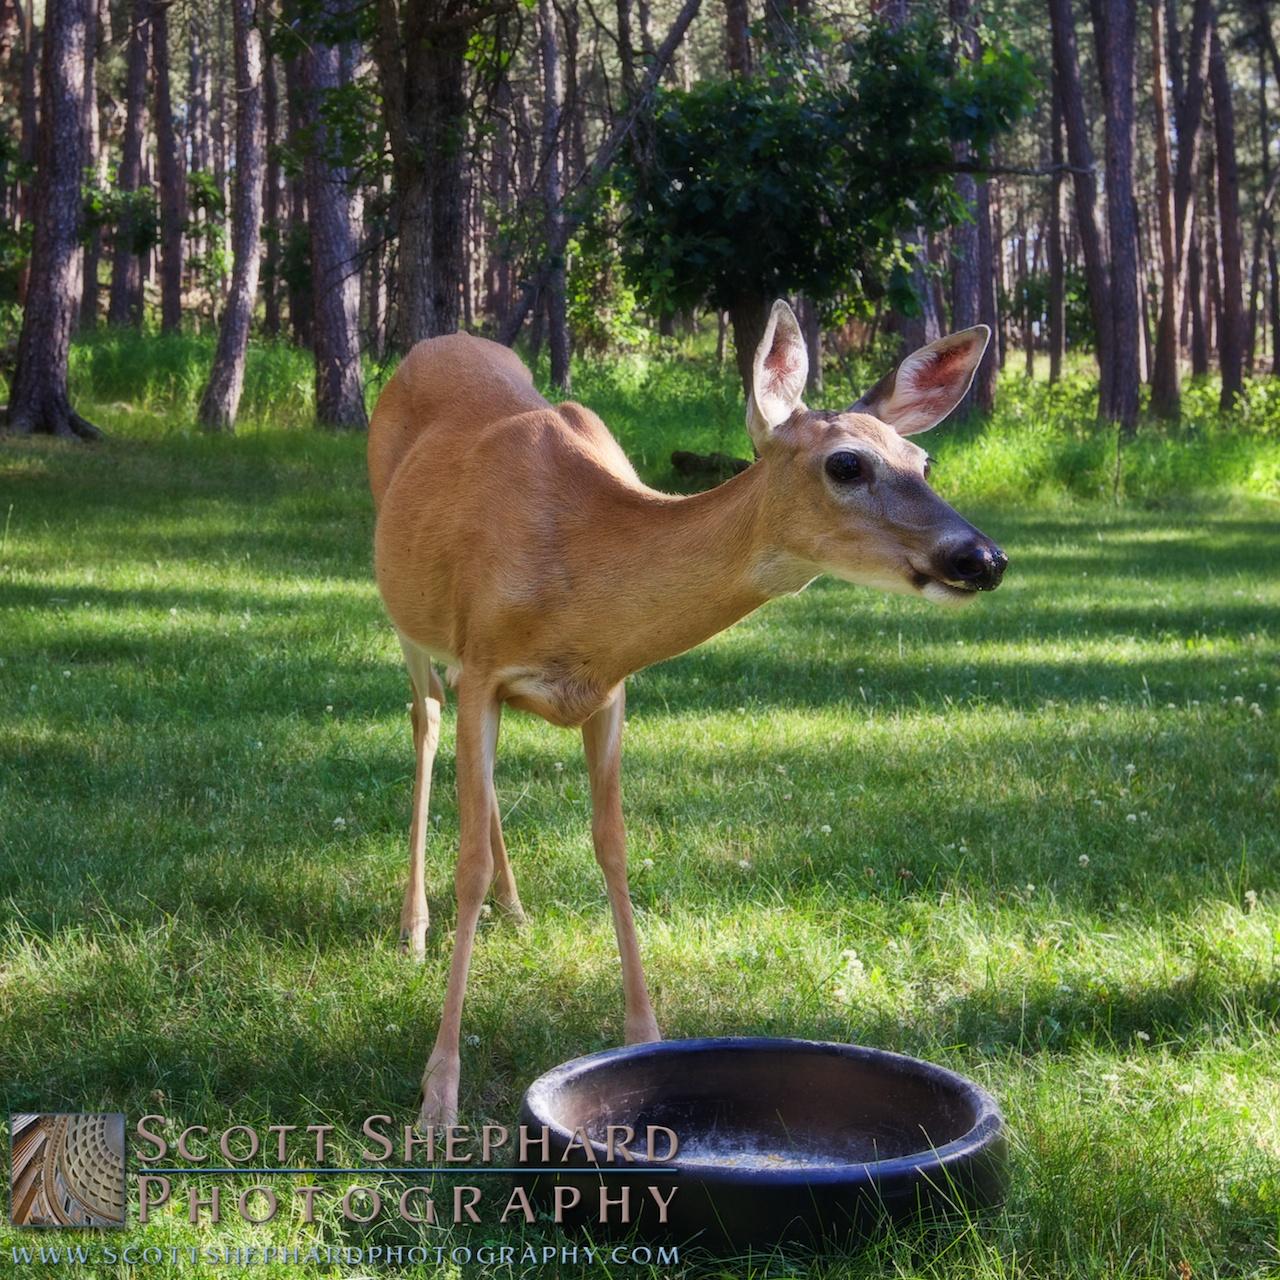 2014 07-22 Our Friend by Watertown, South Dakota, photographer Scott Shephard